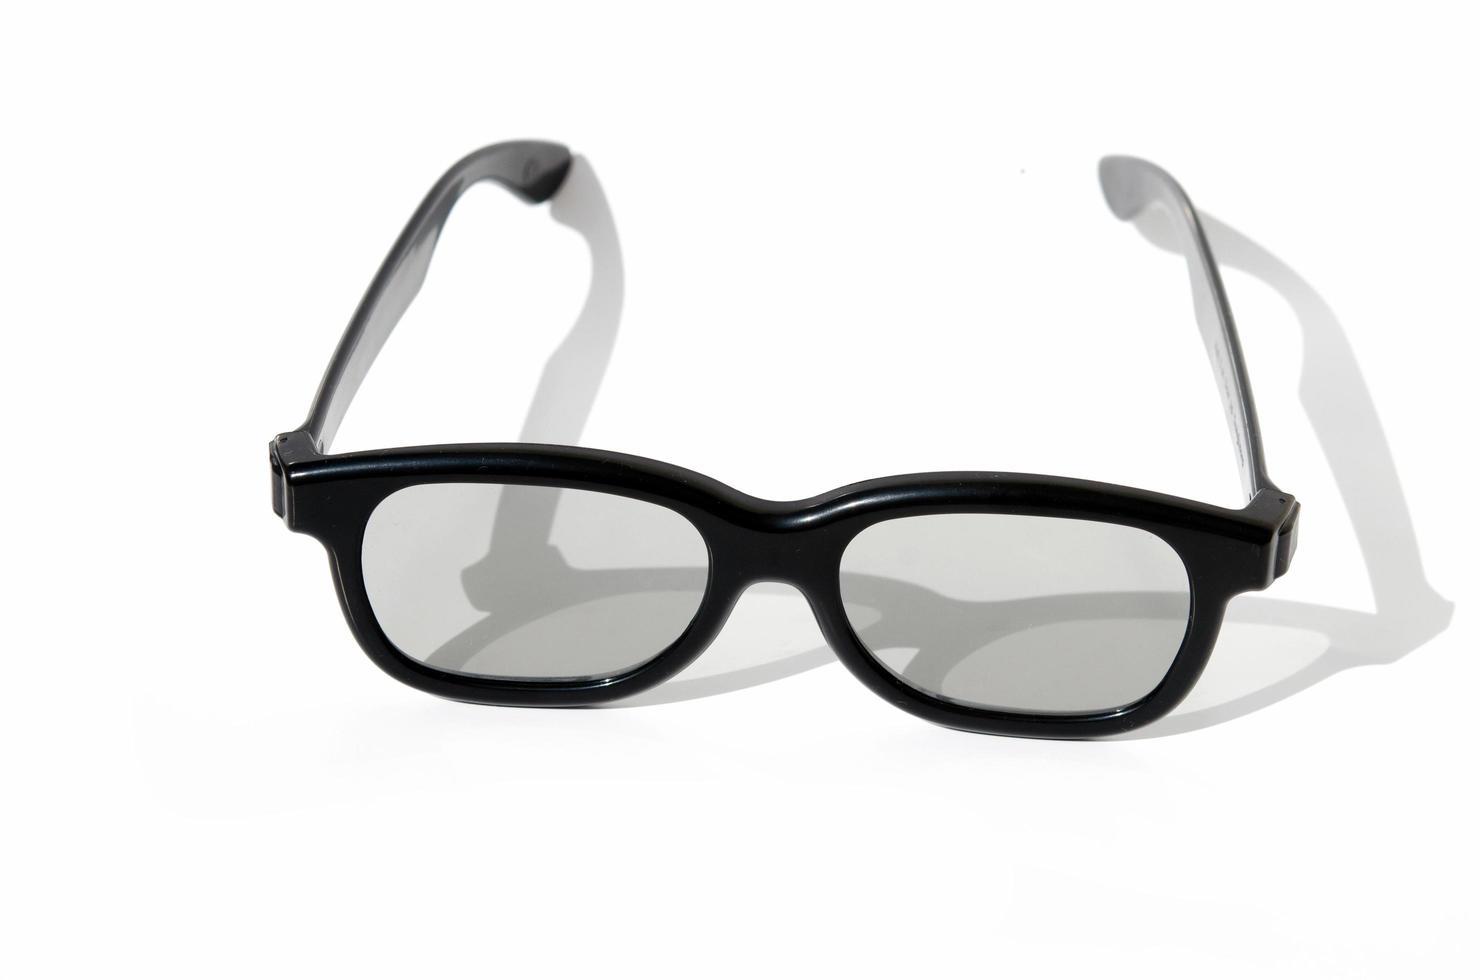 Black glasses on white background photo